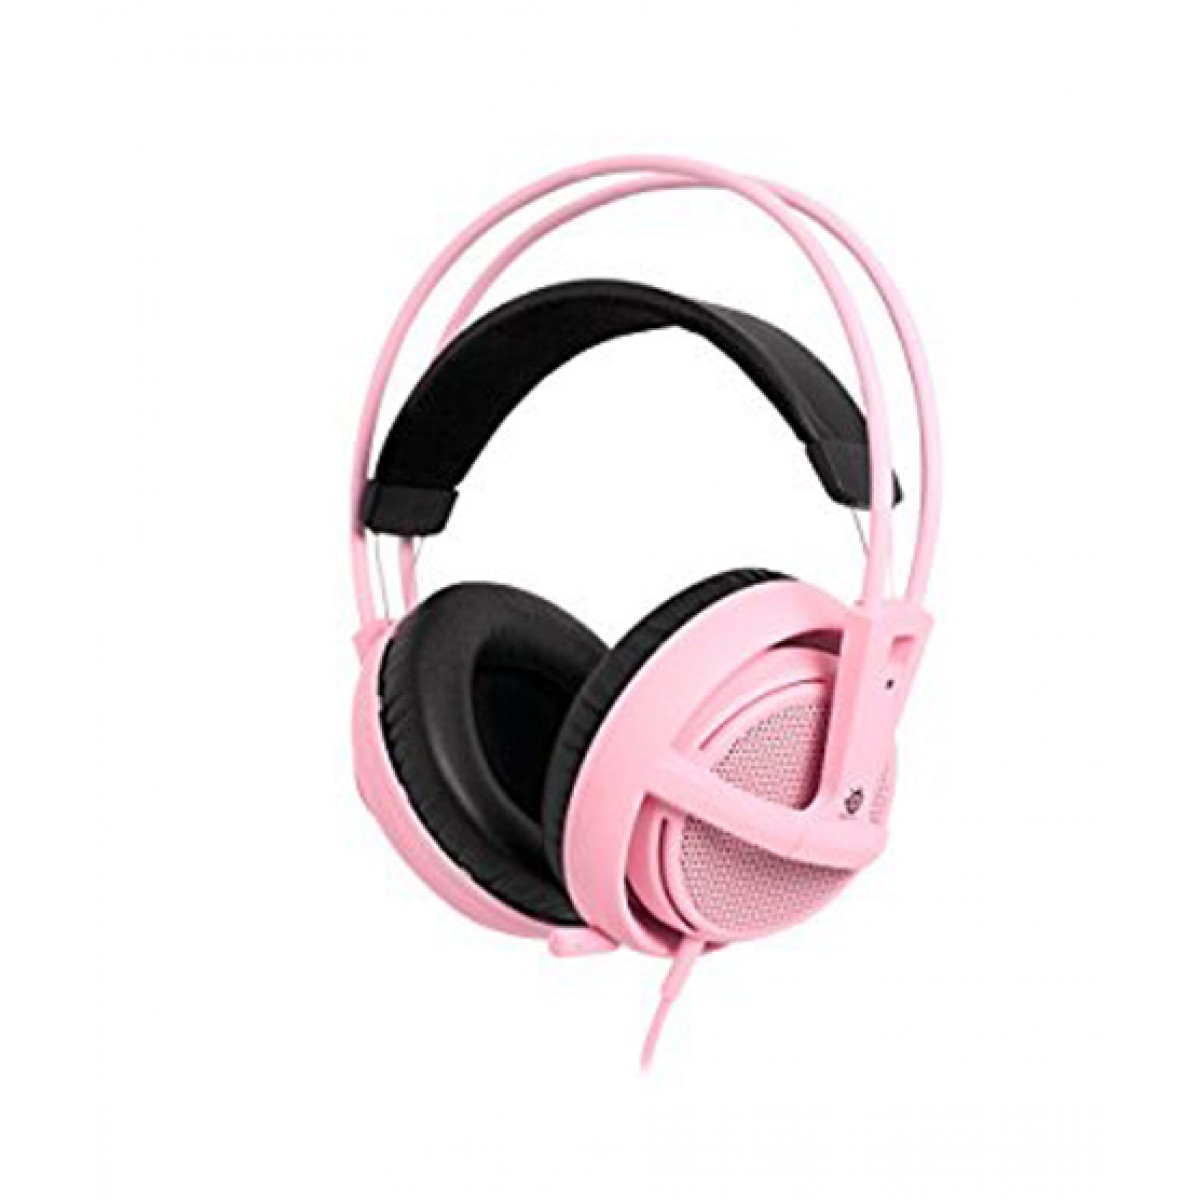 SteelSeries Siberia V2 Over-Ear Gaming Headset Pink